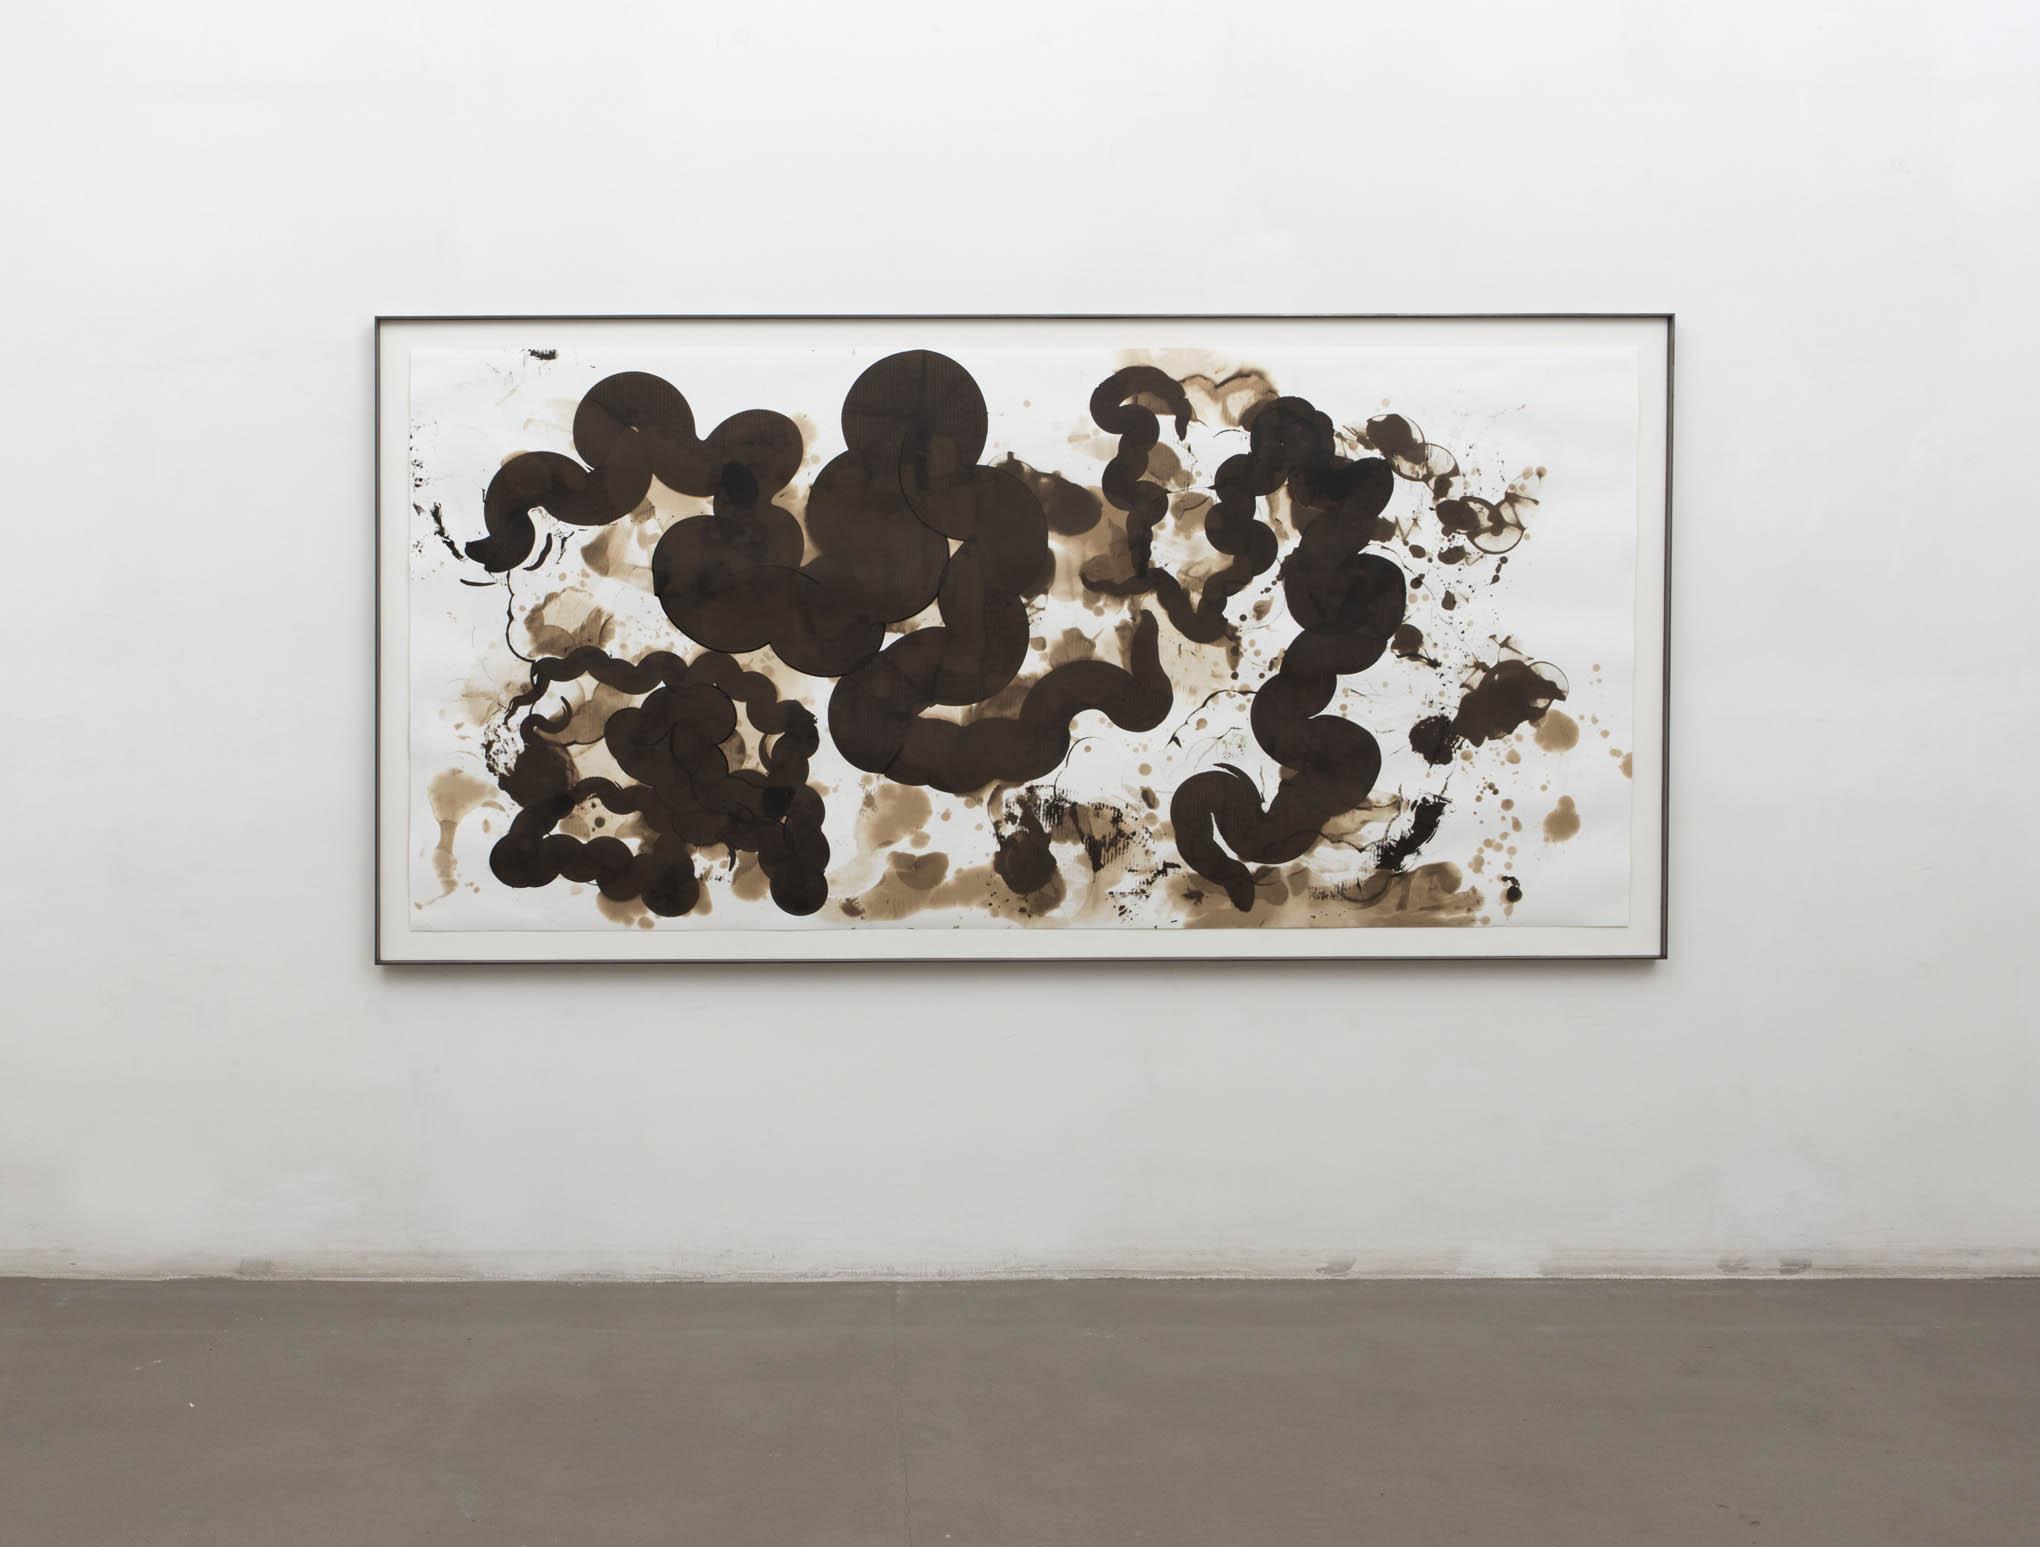 17. Jay Heikes Origins of Smut, 2015